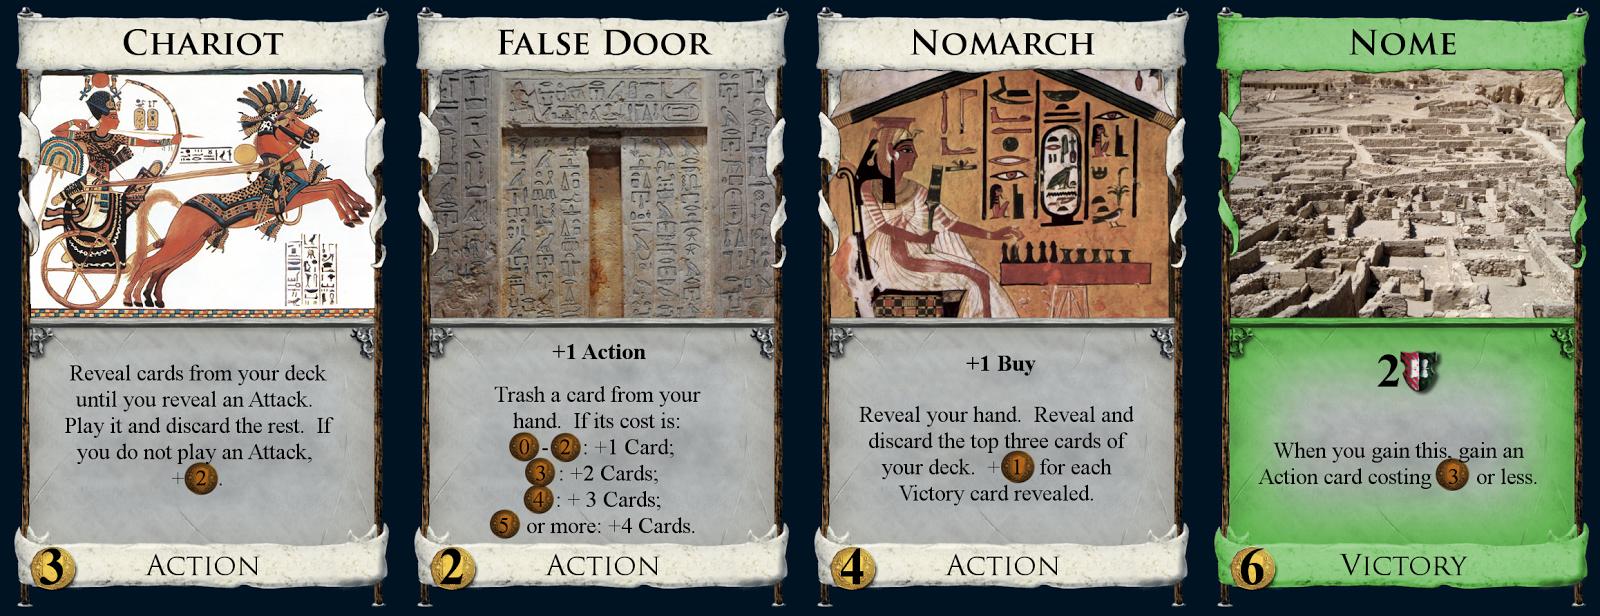 Chariot, False Door, Normarch, Nome